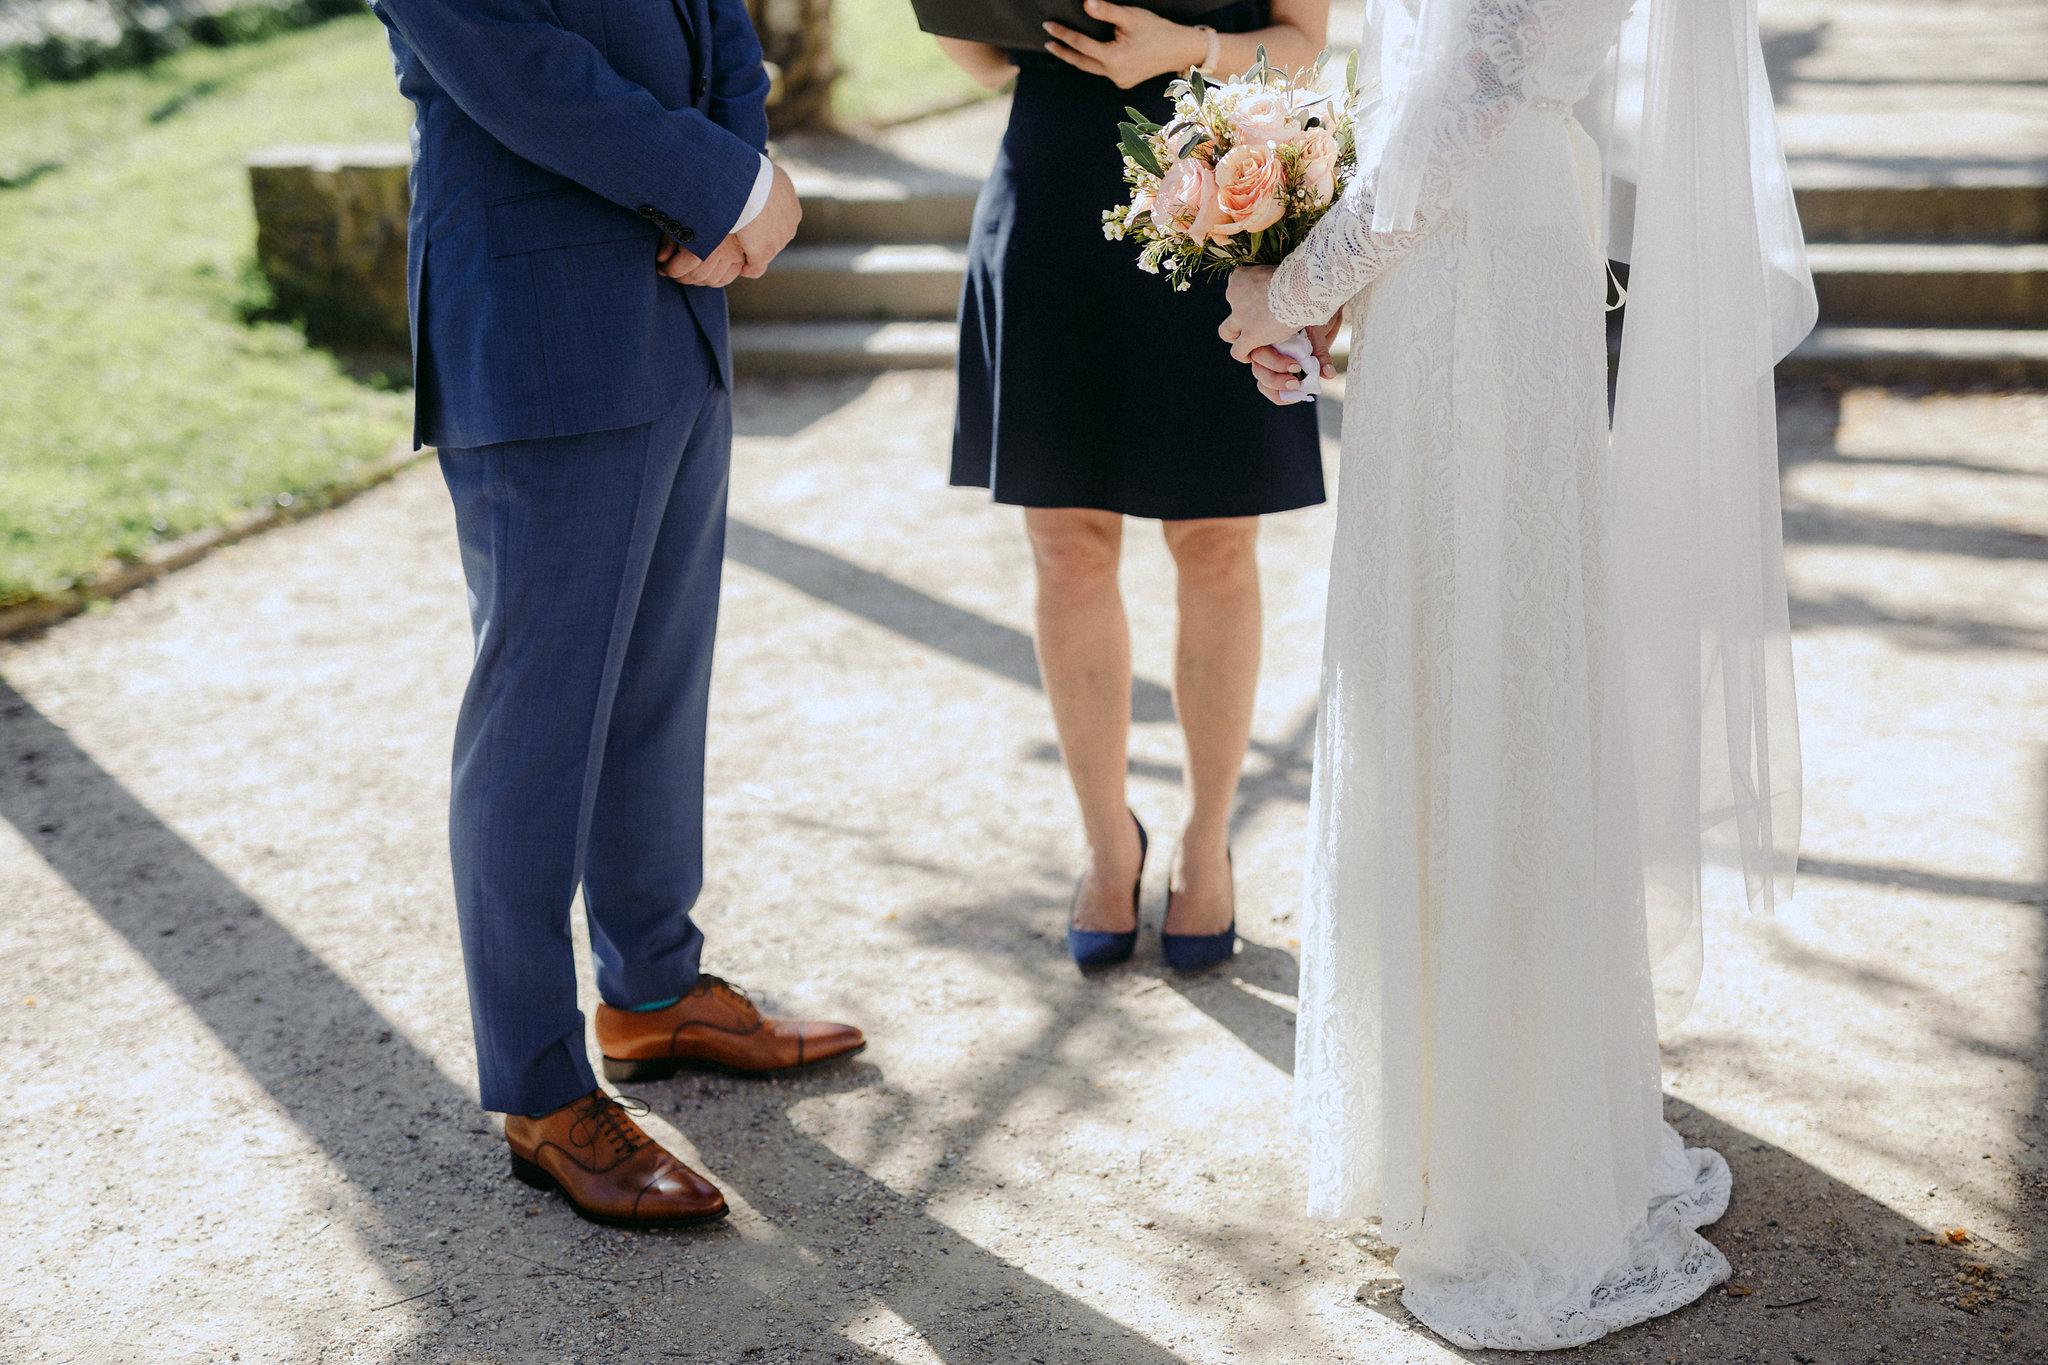 Paris_elopement_wedding_photographer-163.jpg